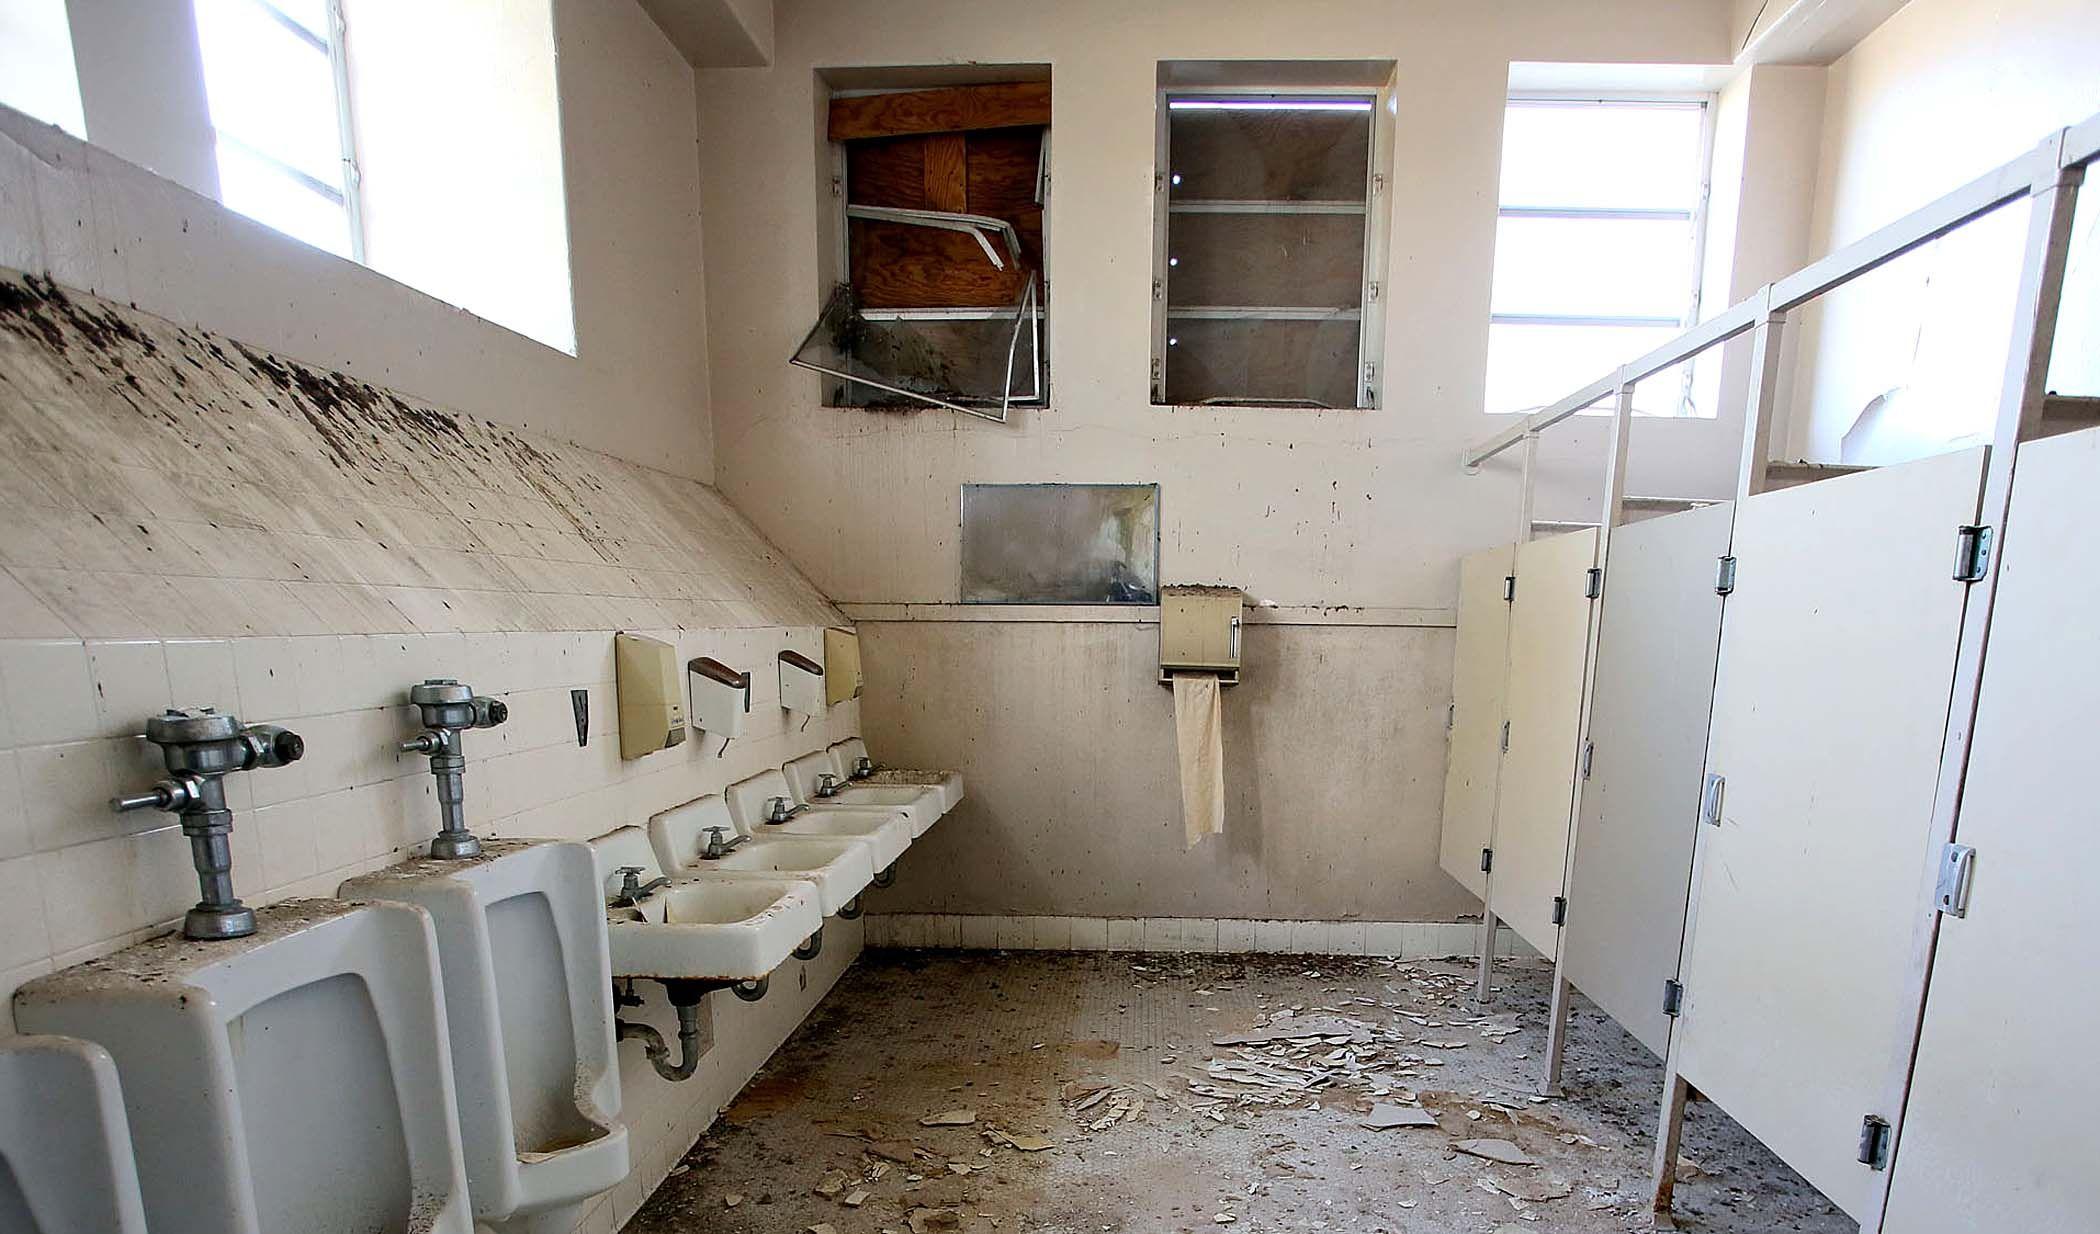 bildresultat fr old school bathroom - School Bathroom Design